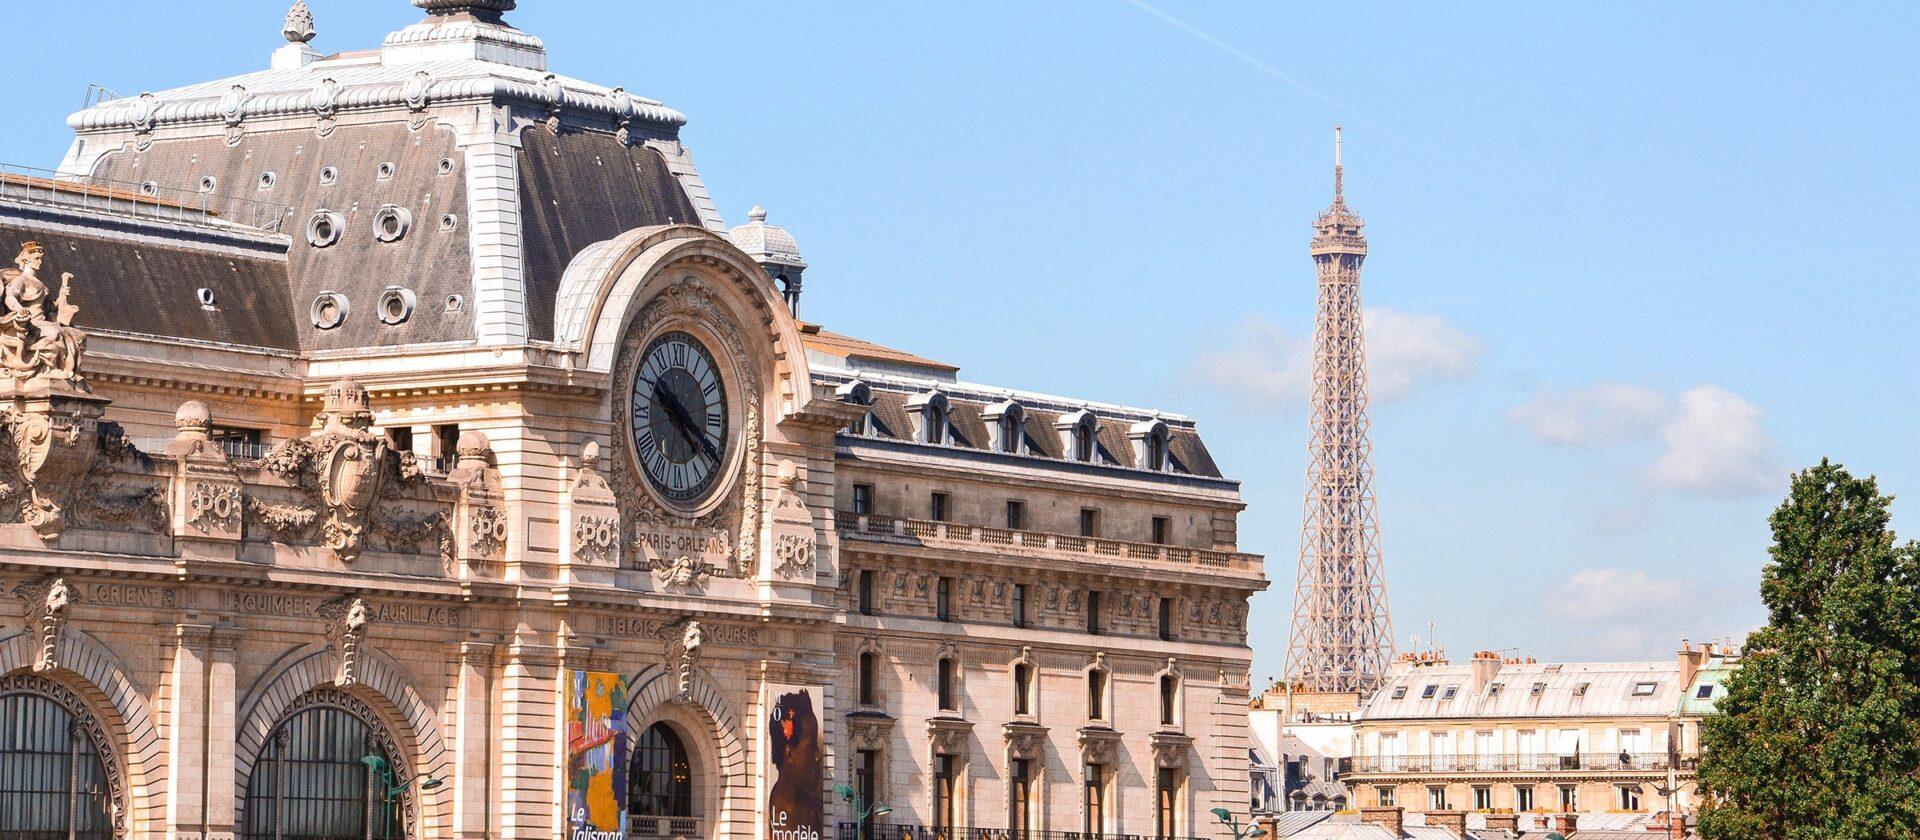 Exterior of Musée d'Orsay in Paris